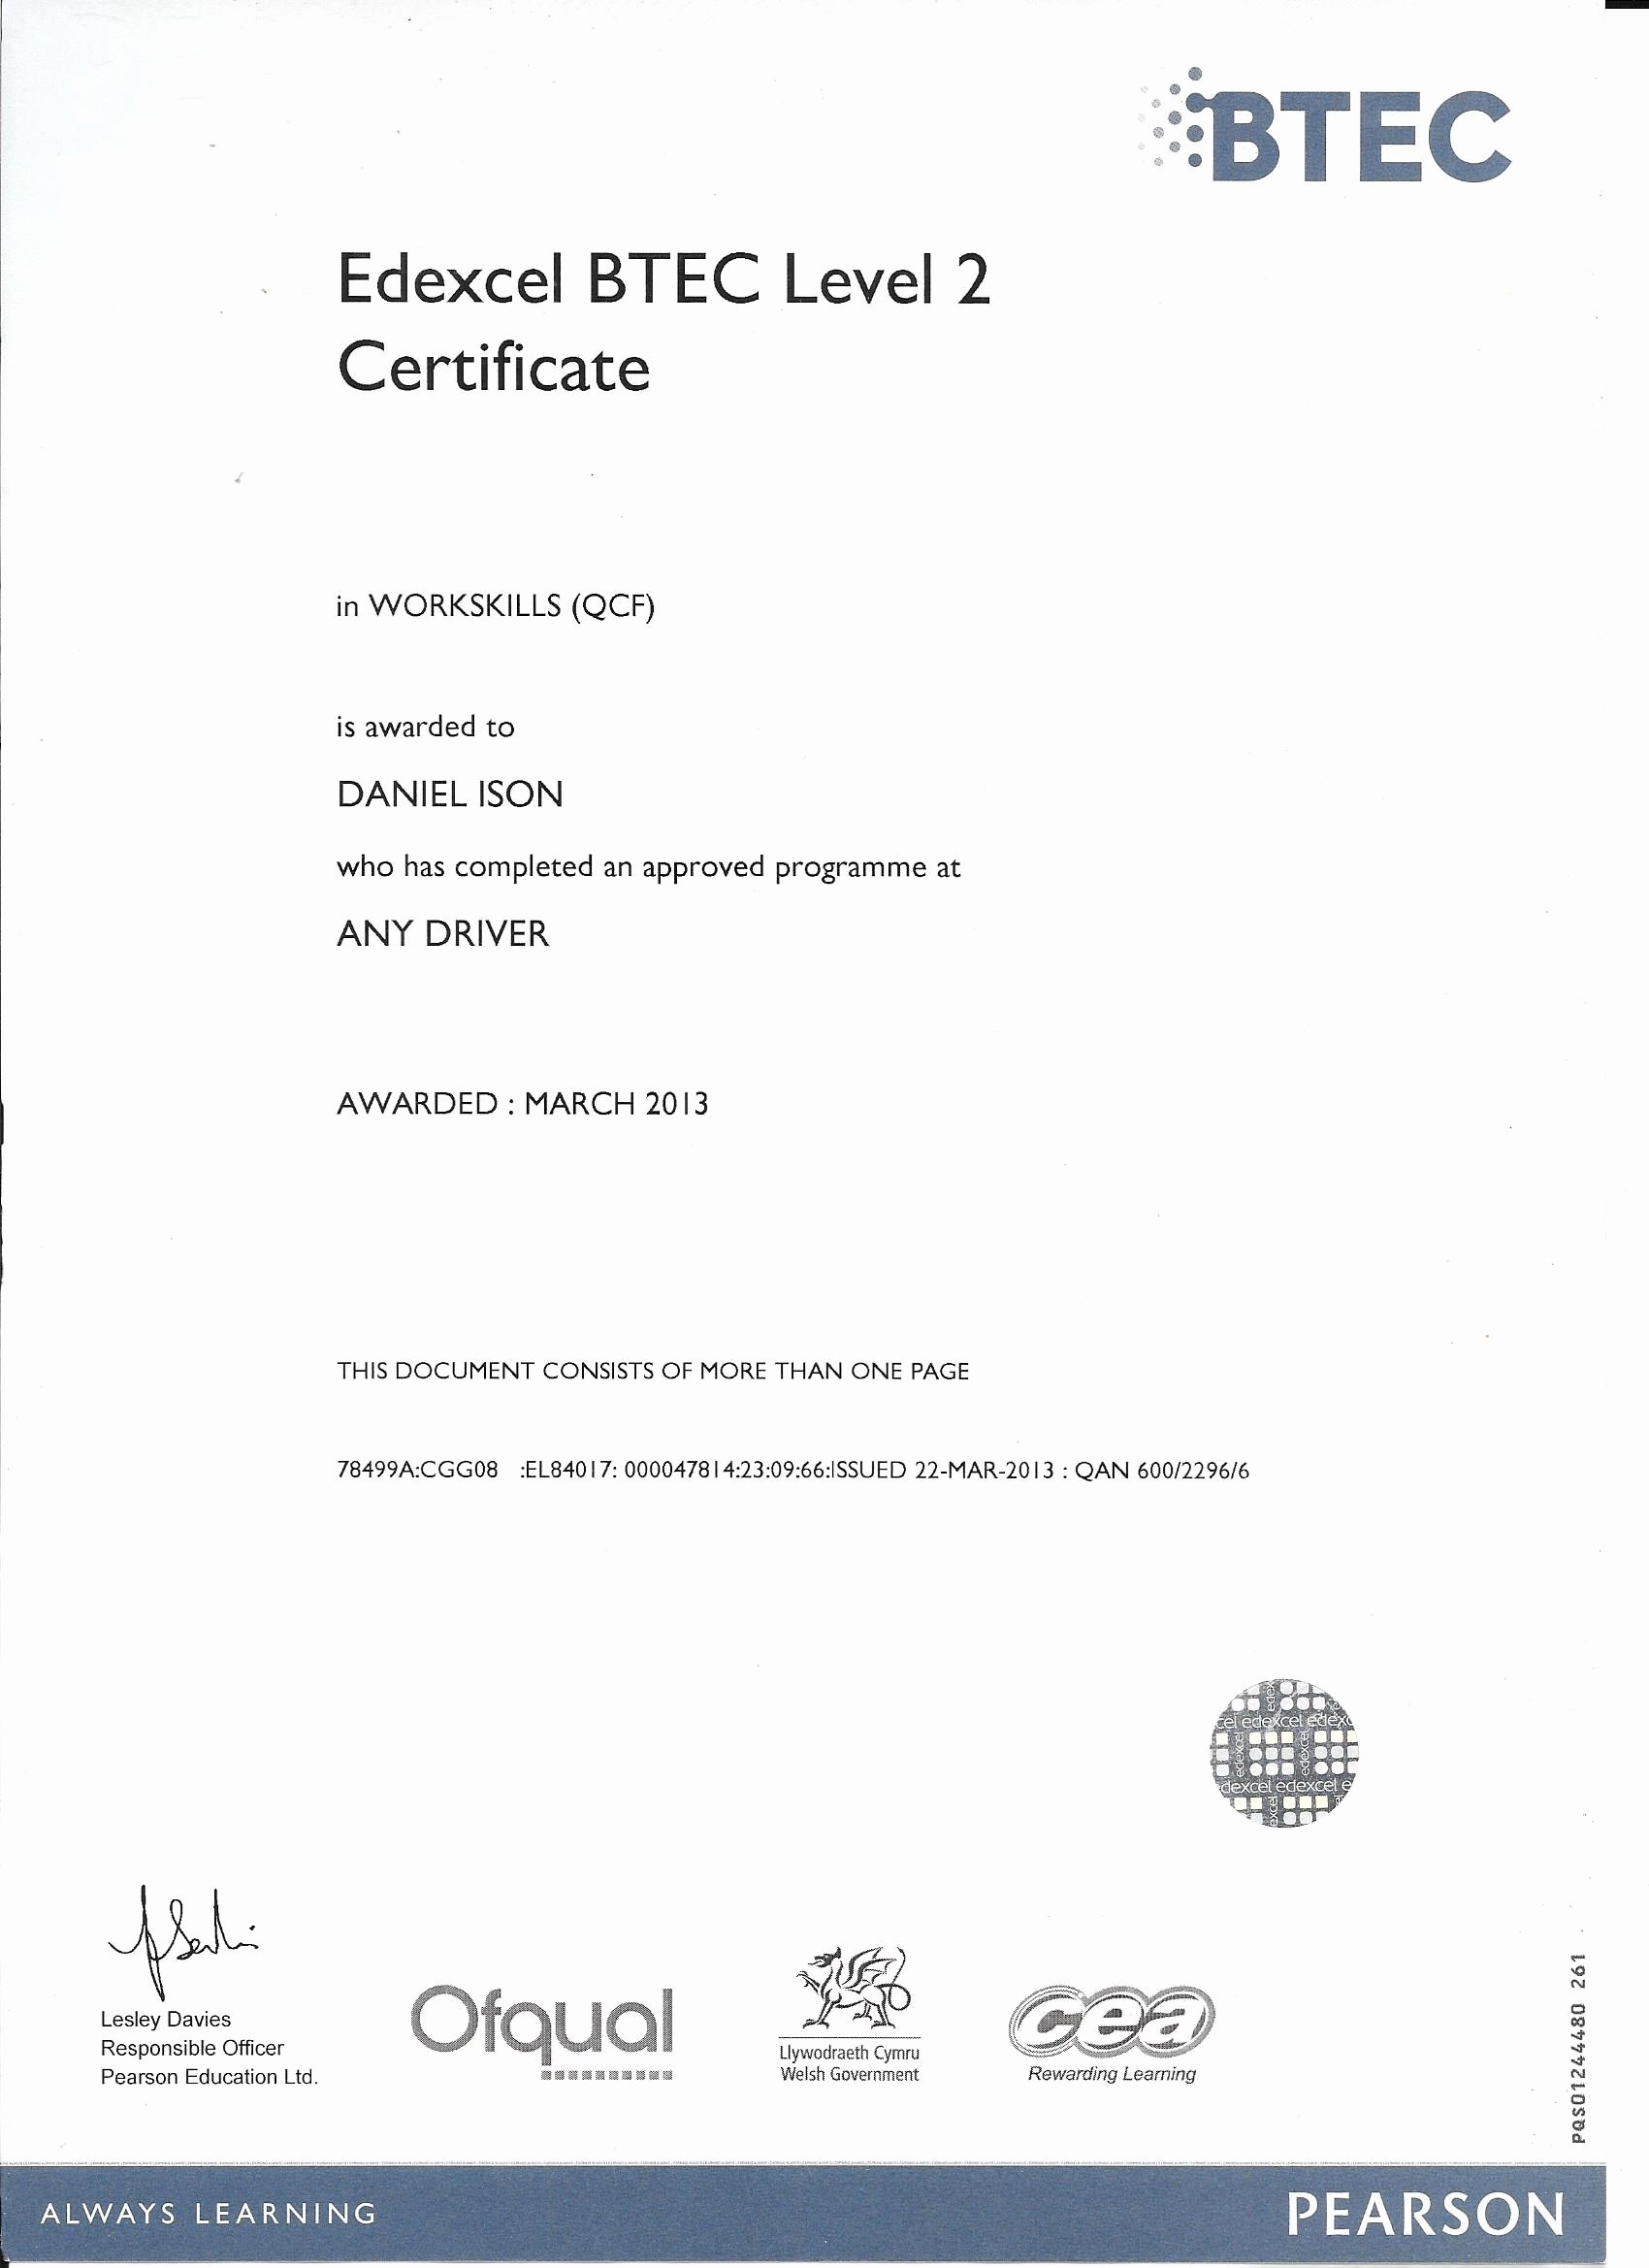 Defensive Driving Certificate Template Elegant Our Certificates